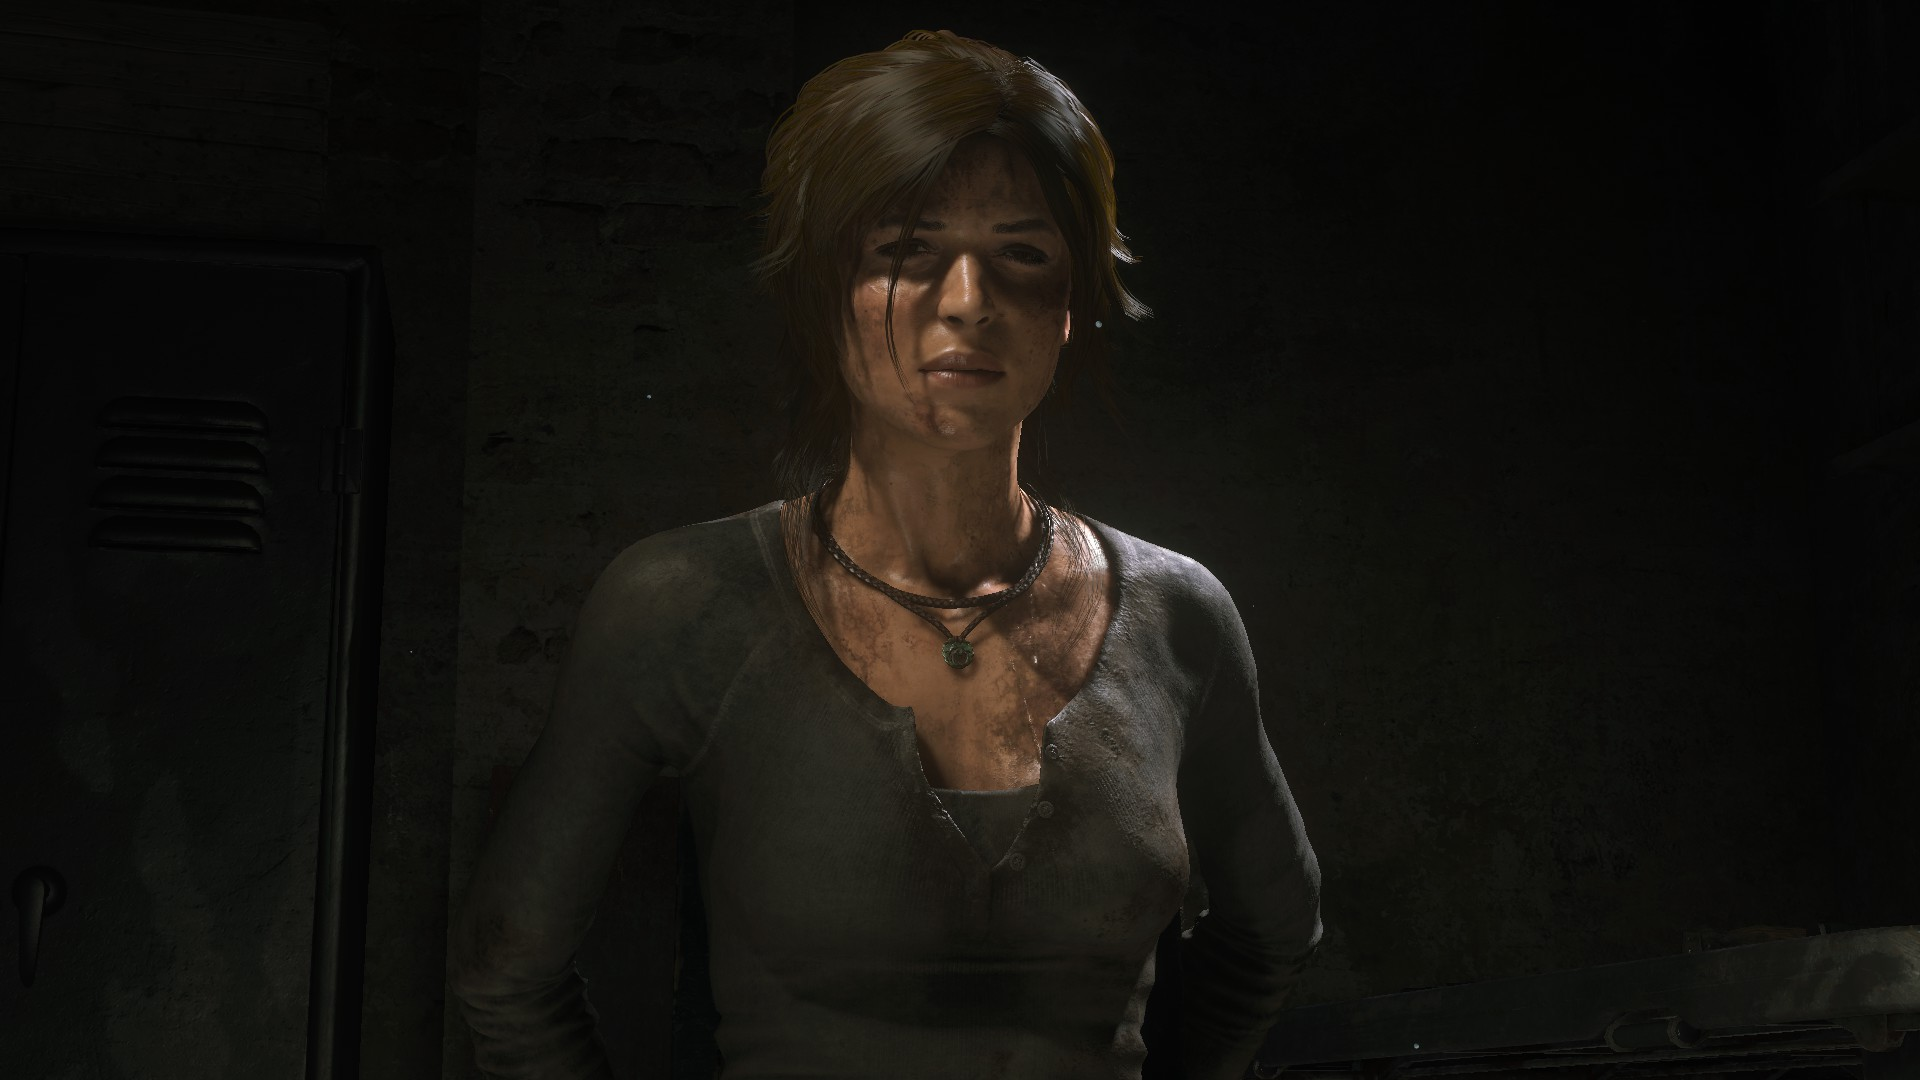 20171129174633_1.jpg - Rise of the Tomb Raider